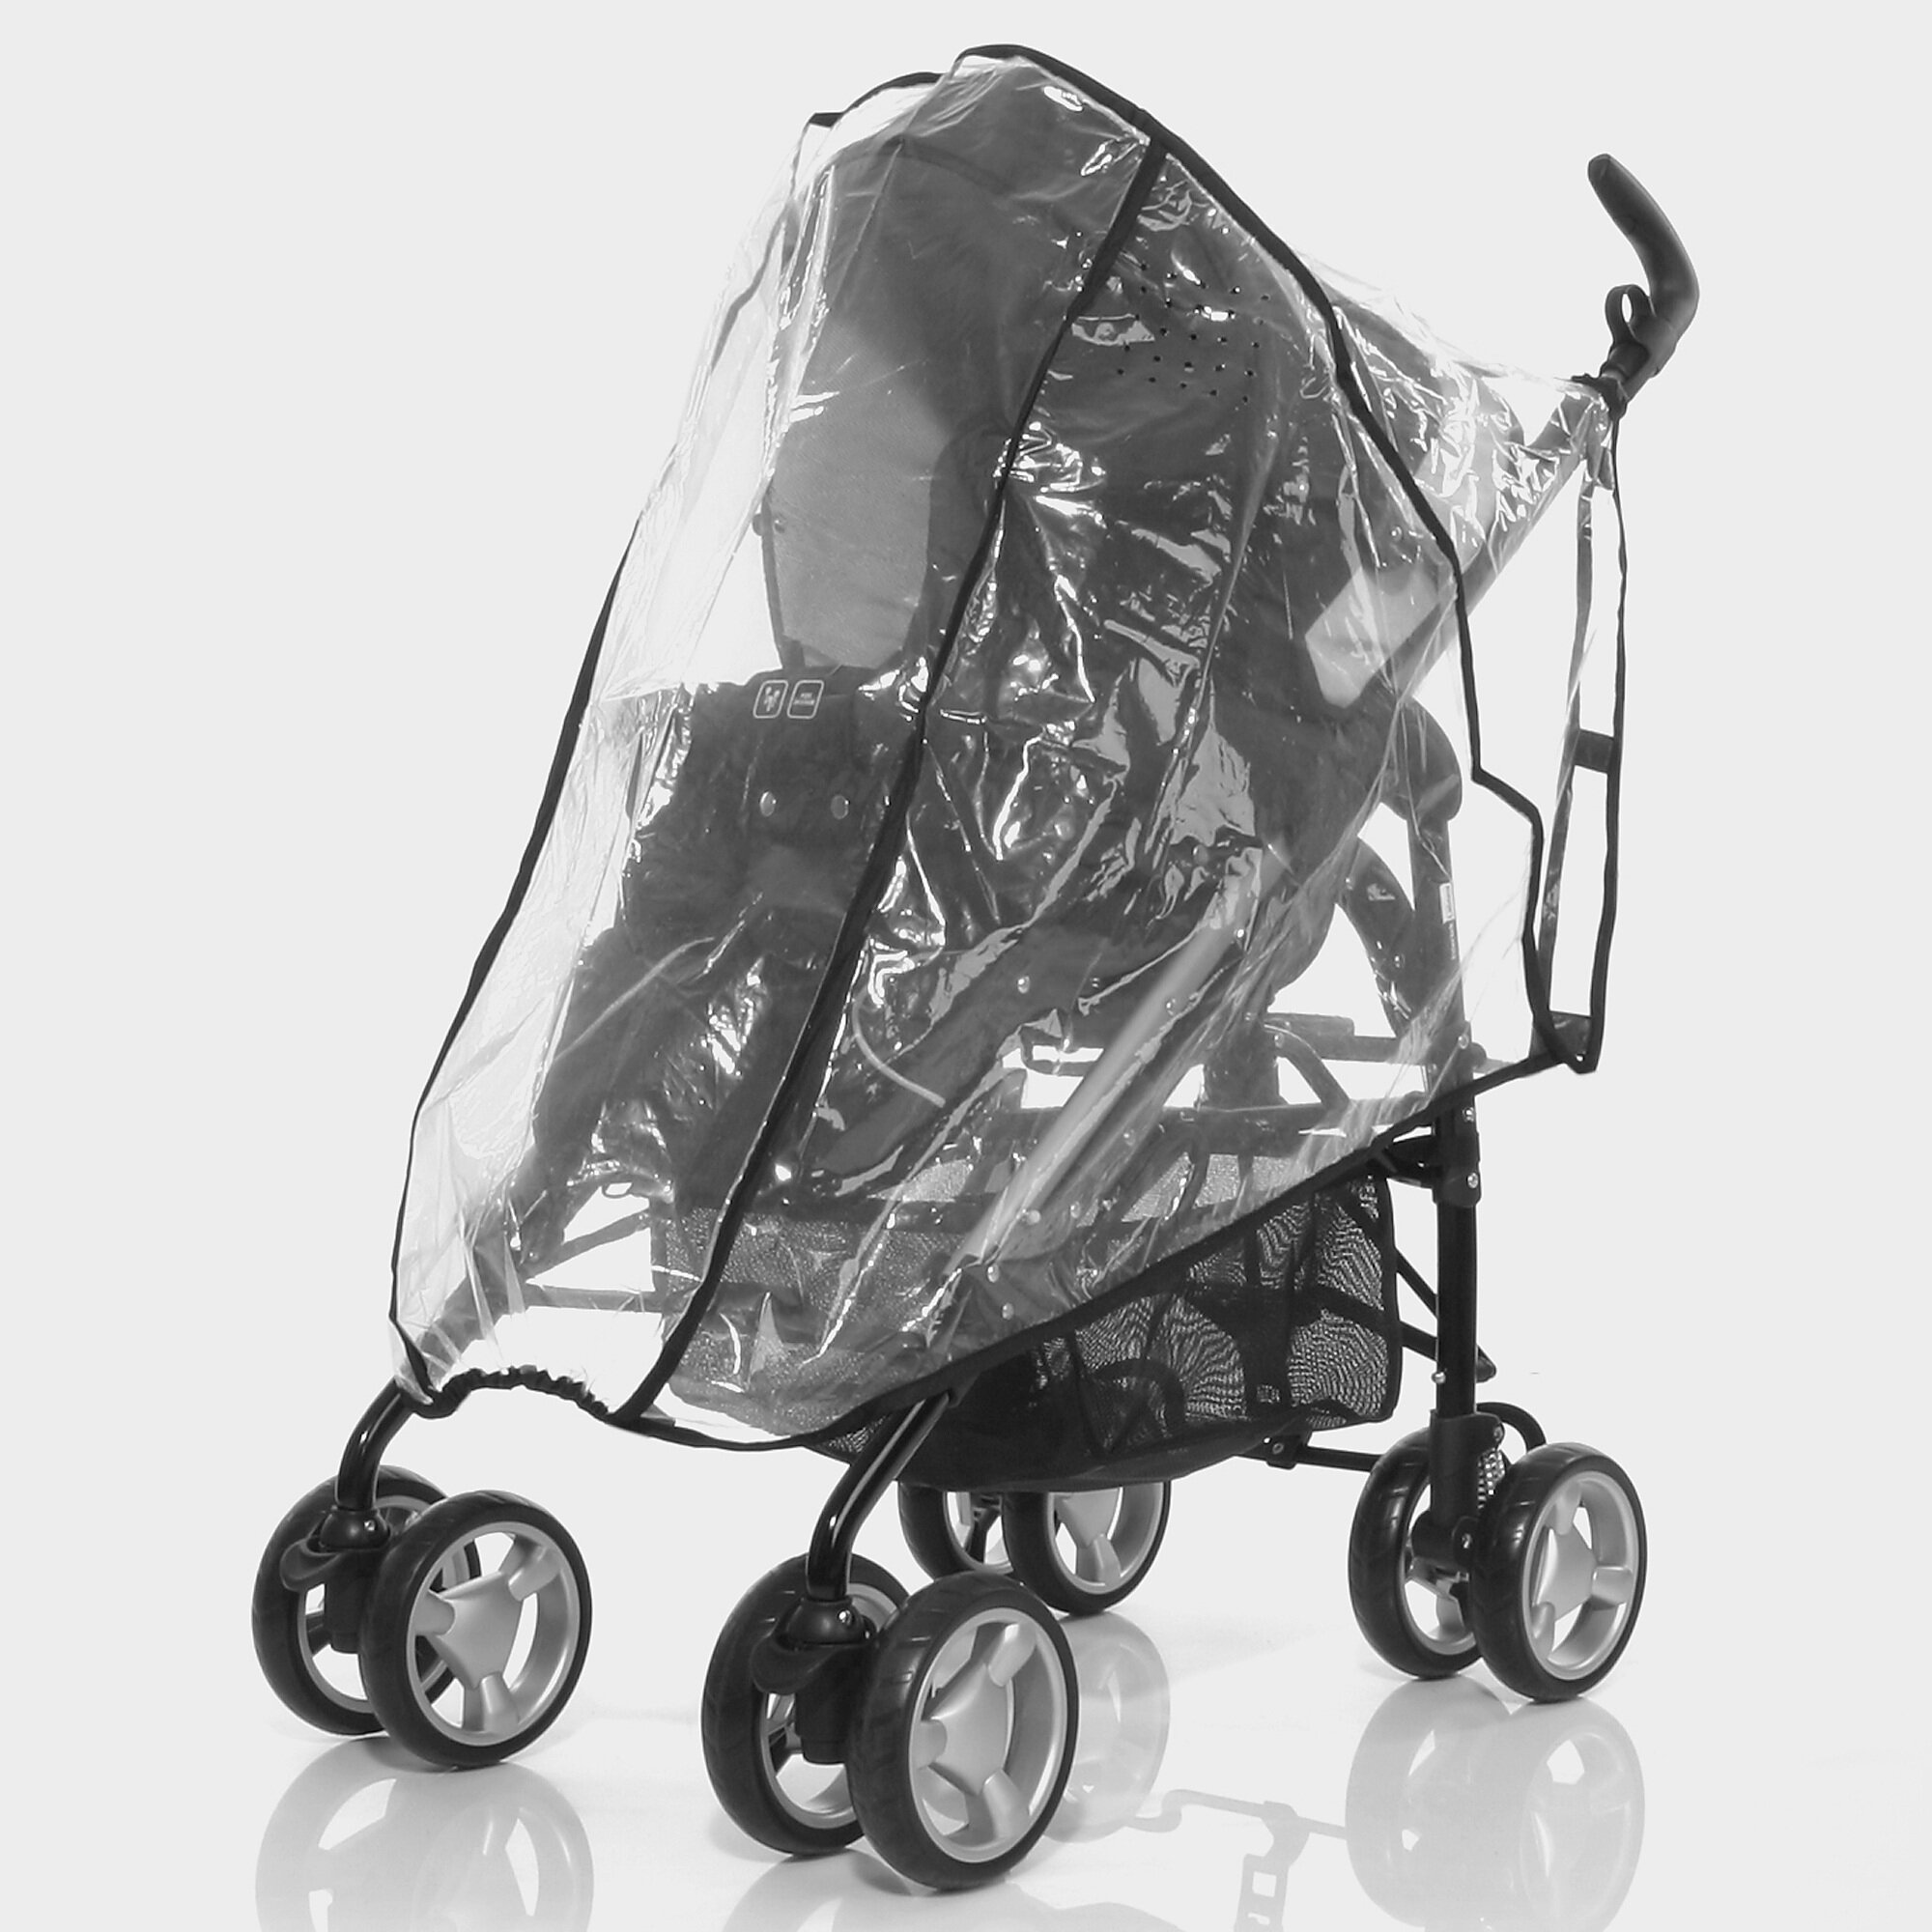 Abc Design Regenschutz für Moji,Okini, Mint, Takeoff, Avito, Moving transparent